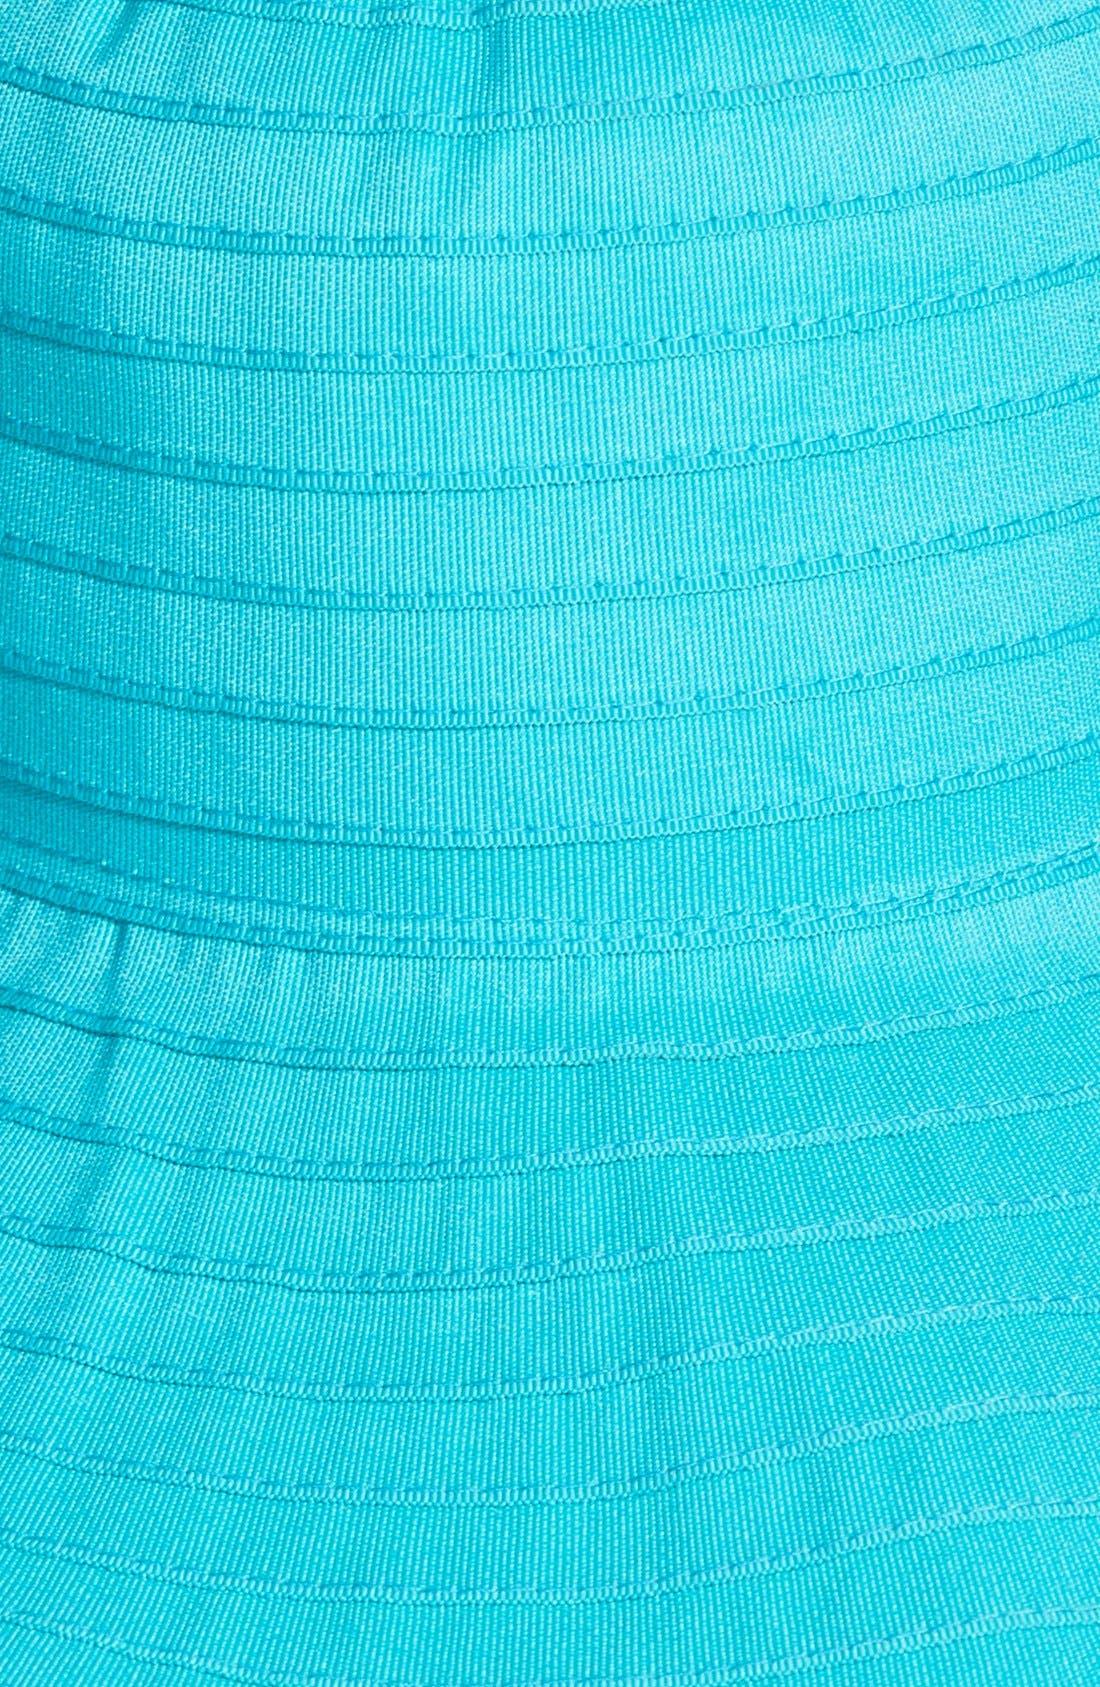 Alternate Image 2  - August Hat 'Ribbons' Sun Hat